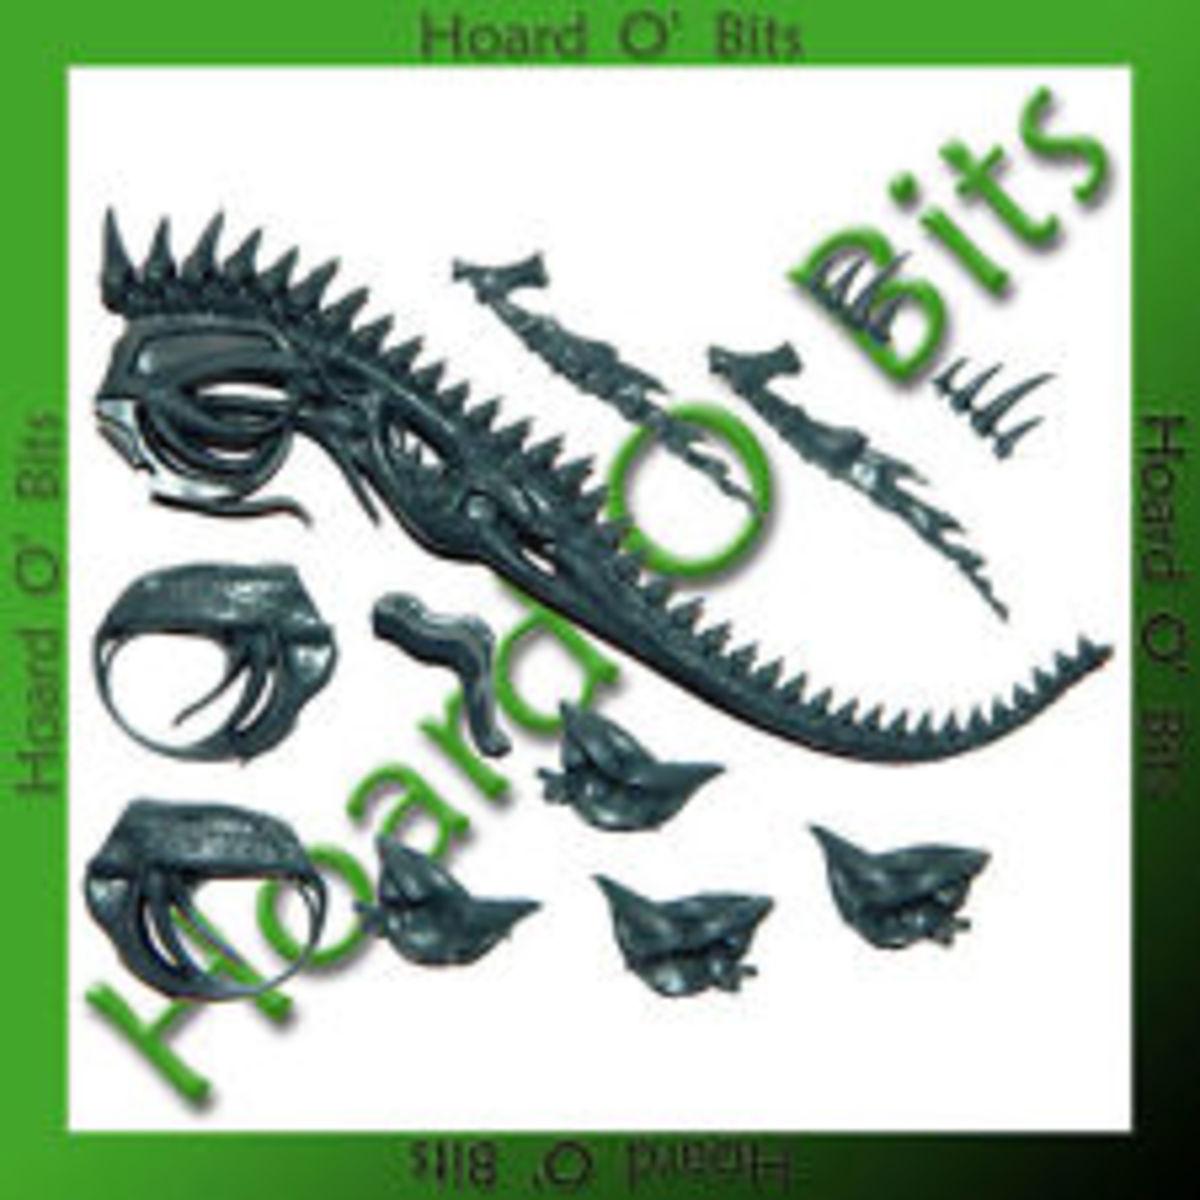 heldrake-conversion-part-2-chaos-space-marines-warhammer-40k